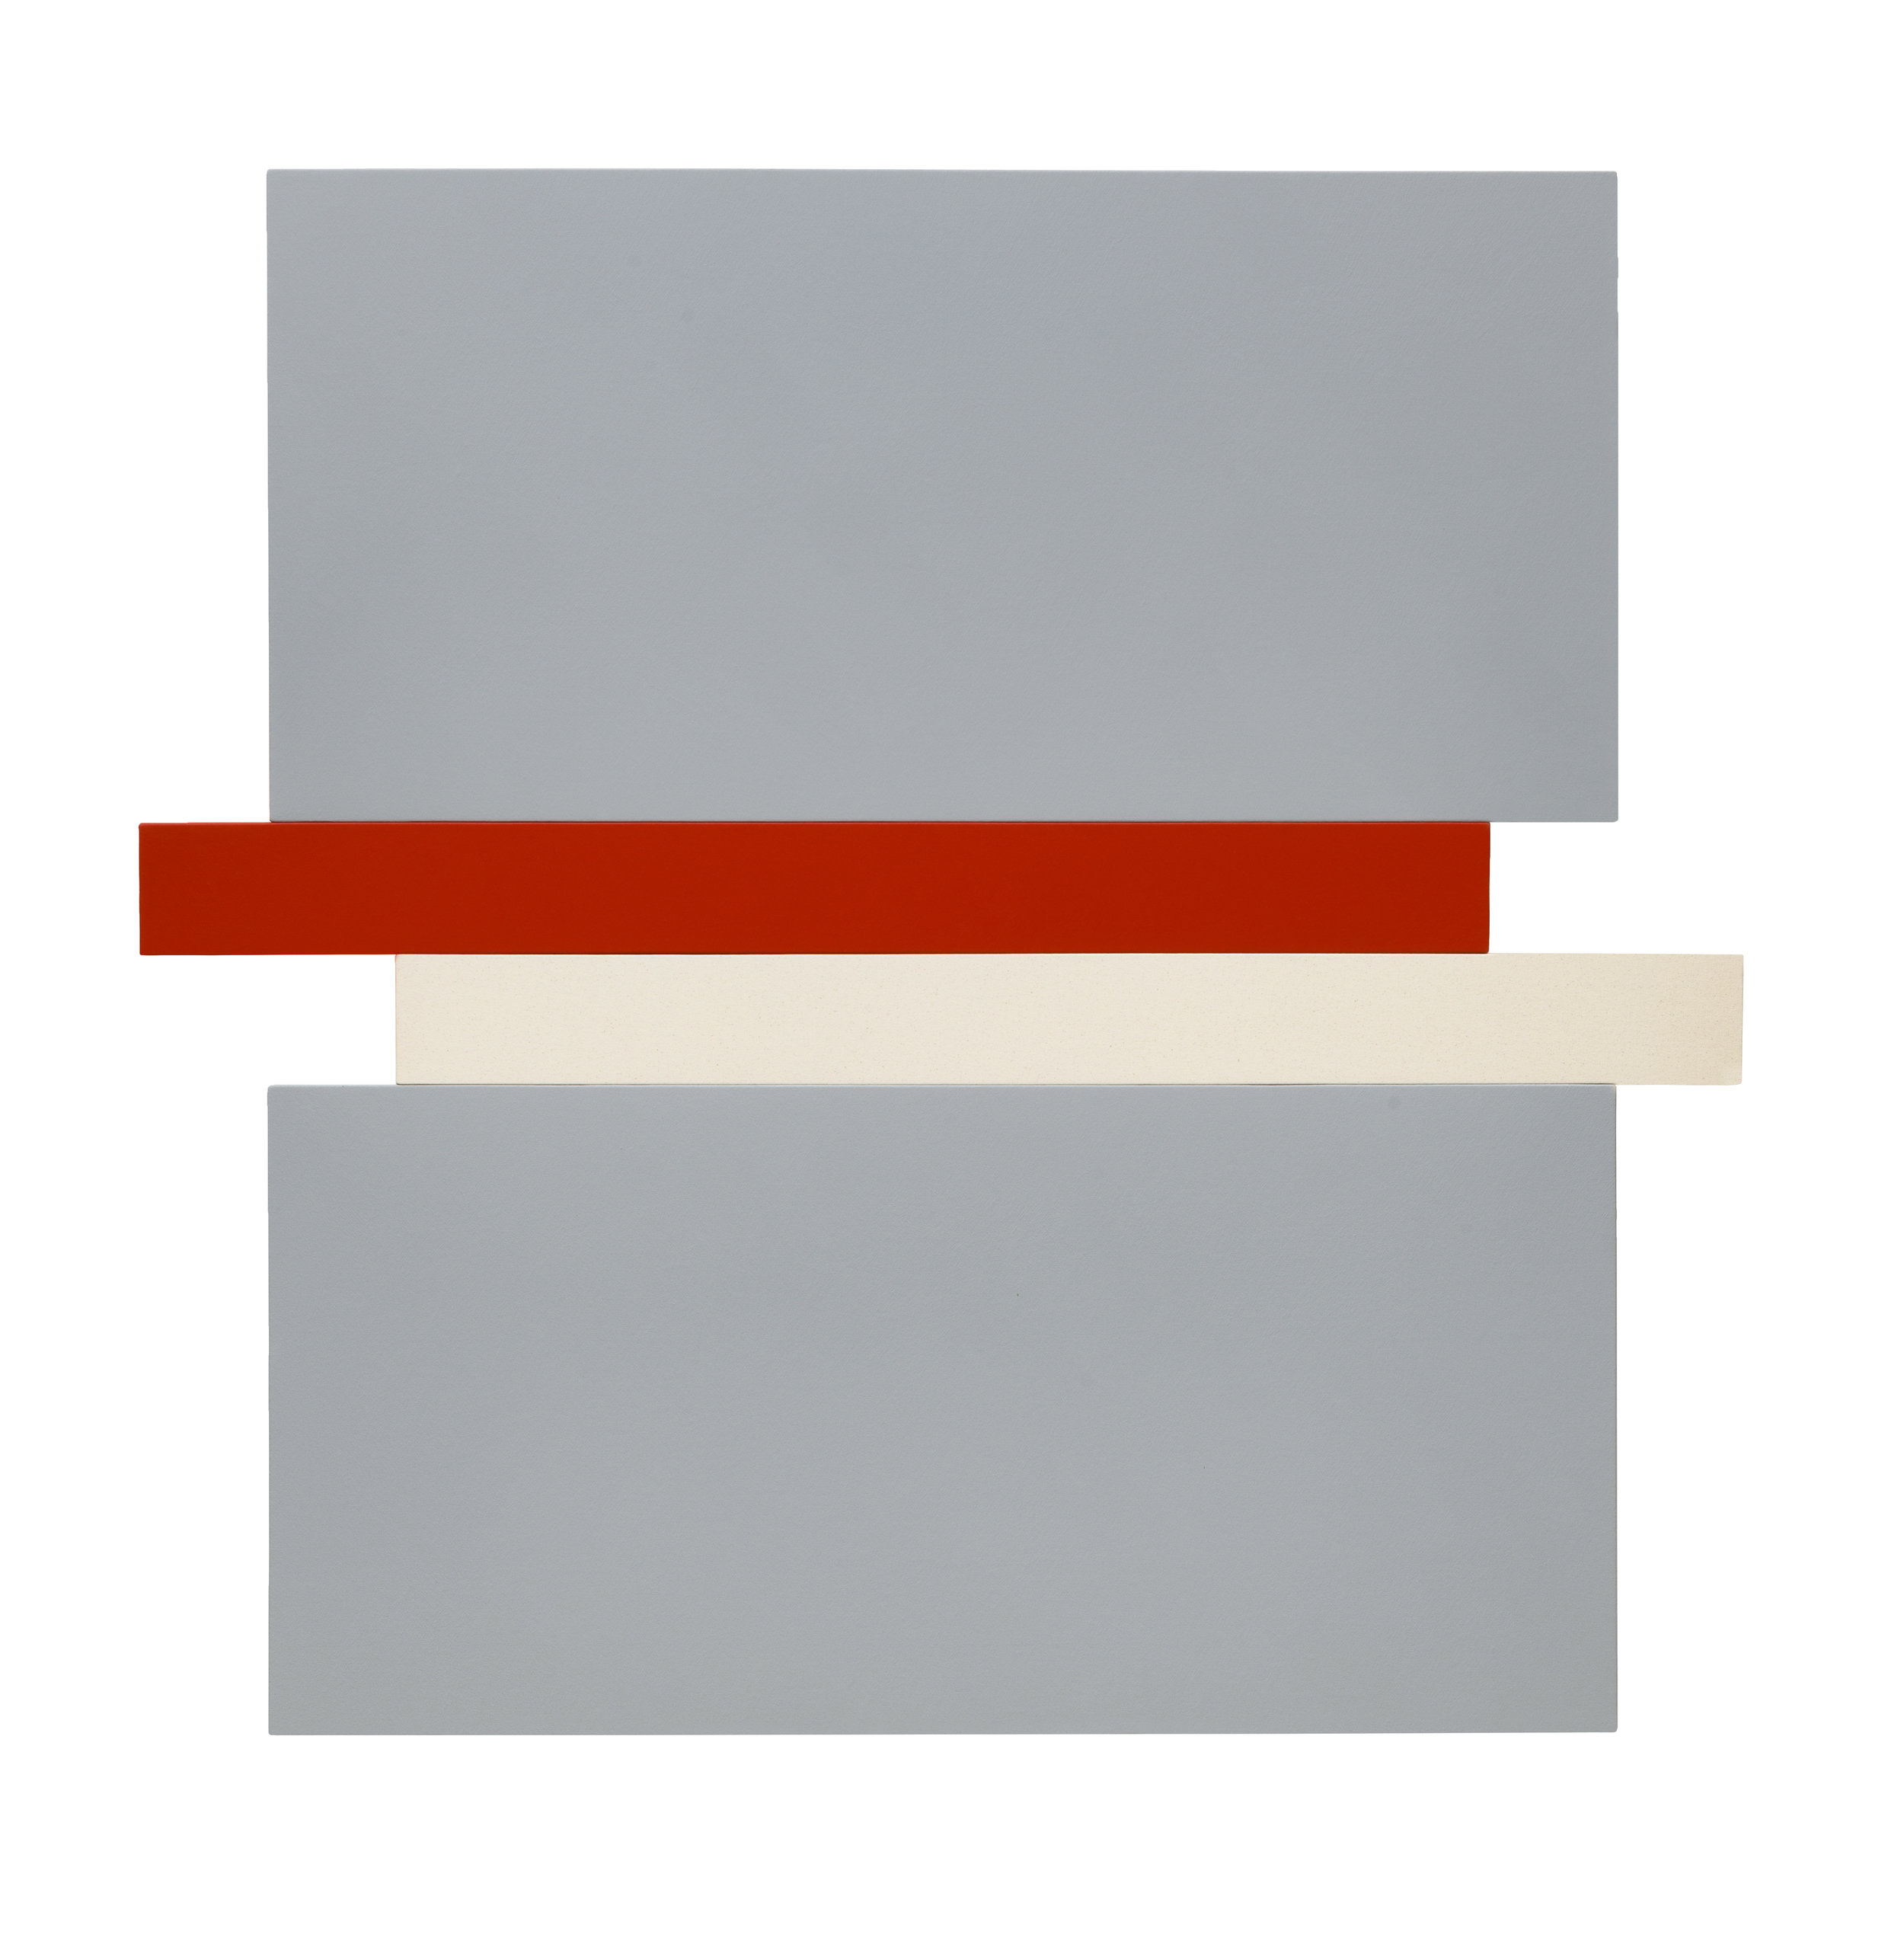 COMPRESSION - GREY, RED, CANVAS